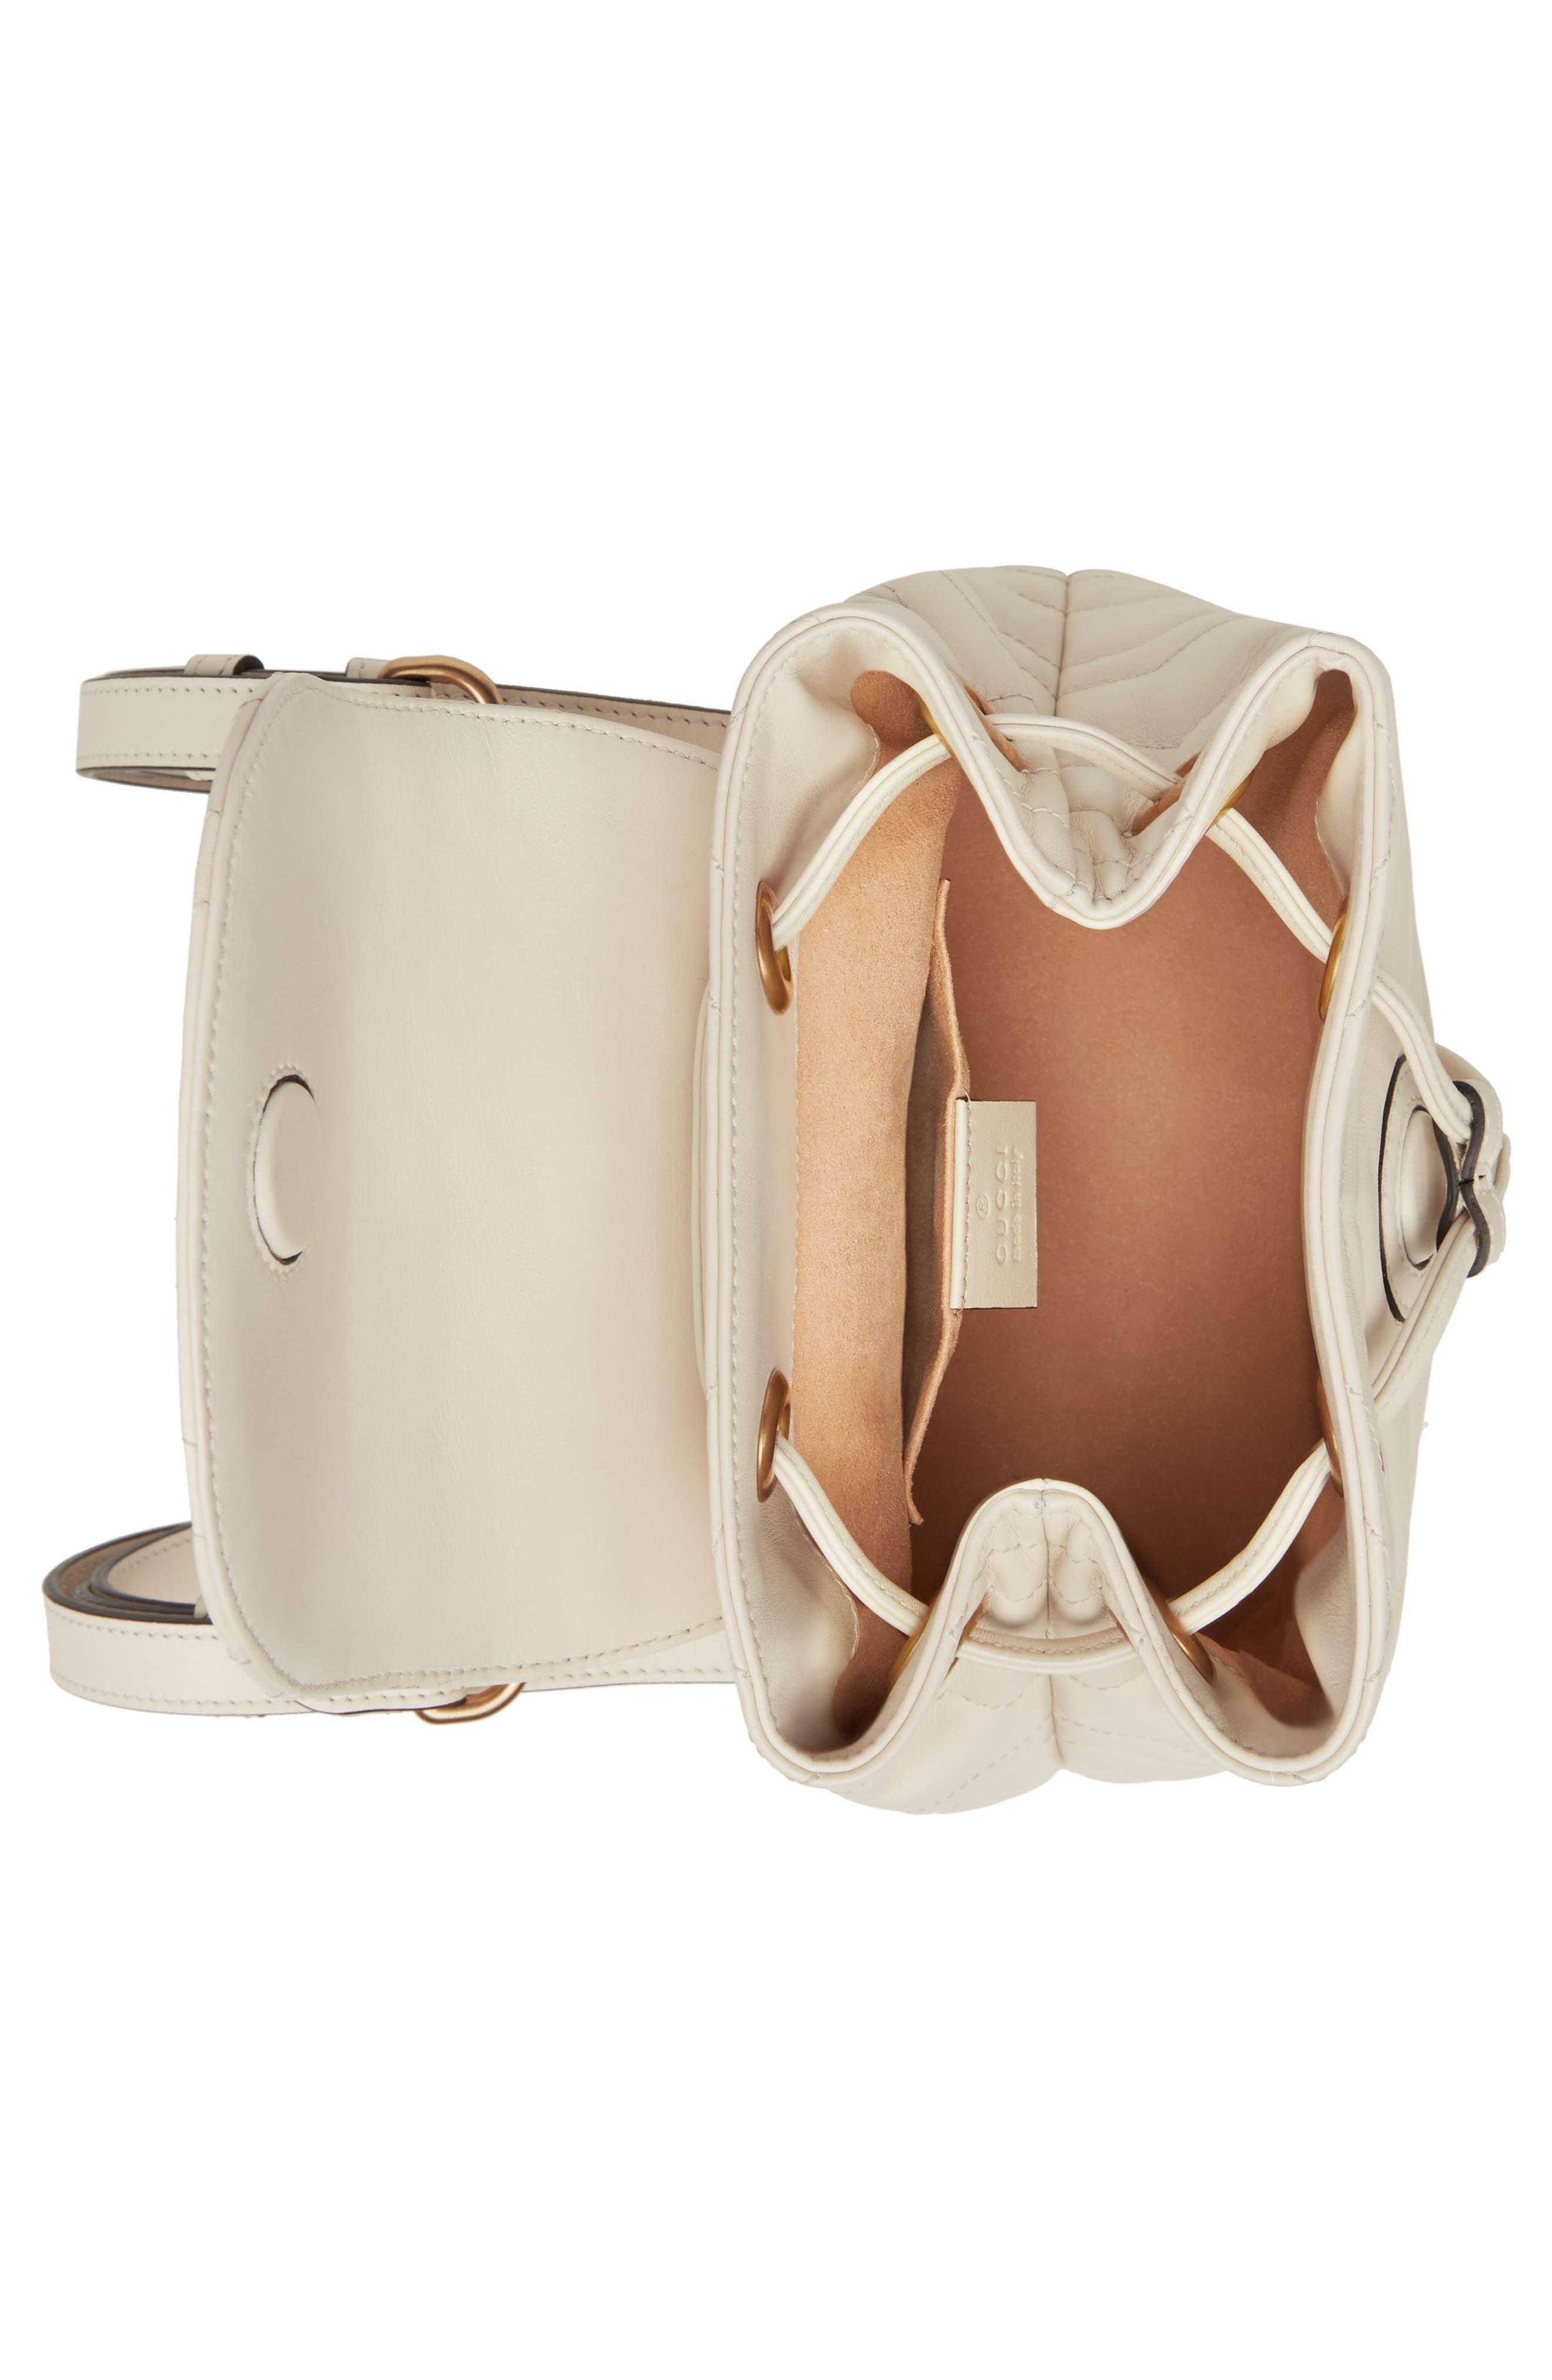 GUCCI, GG Marmont 2.0 Matelassé Leather Mini Backpack, Alternate thumbnail 3, color, MYSTIC WHITE